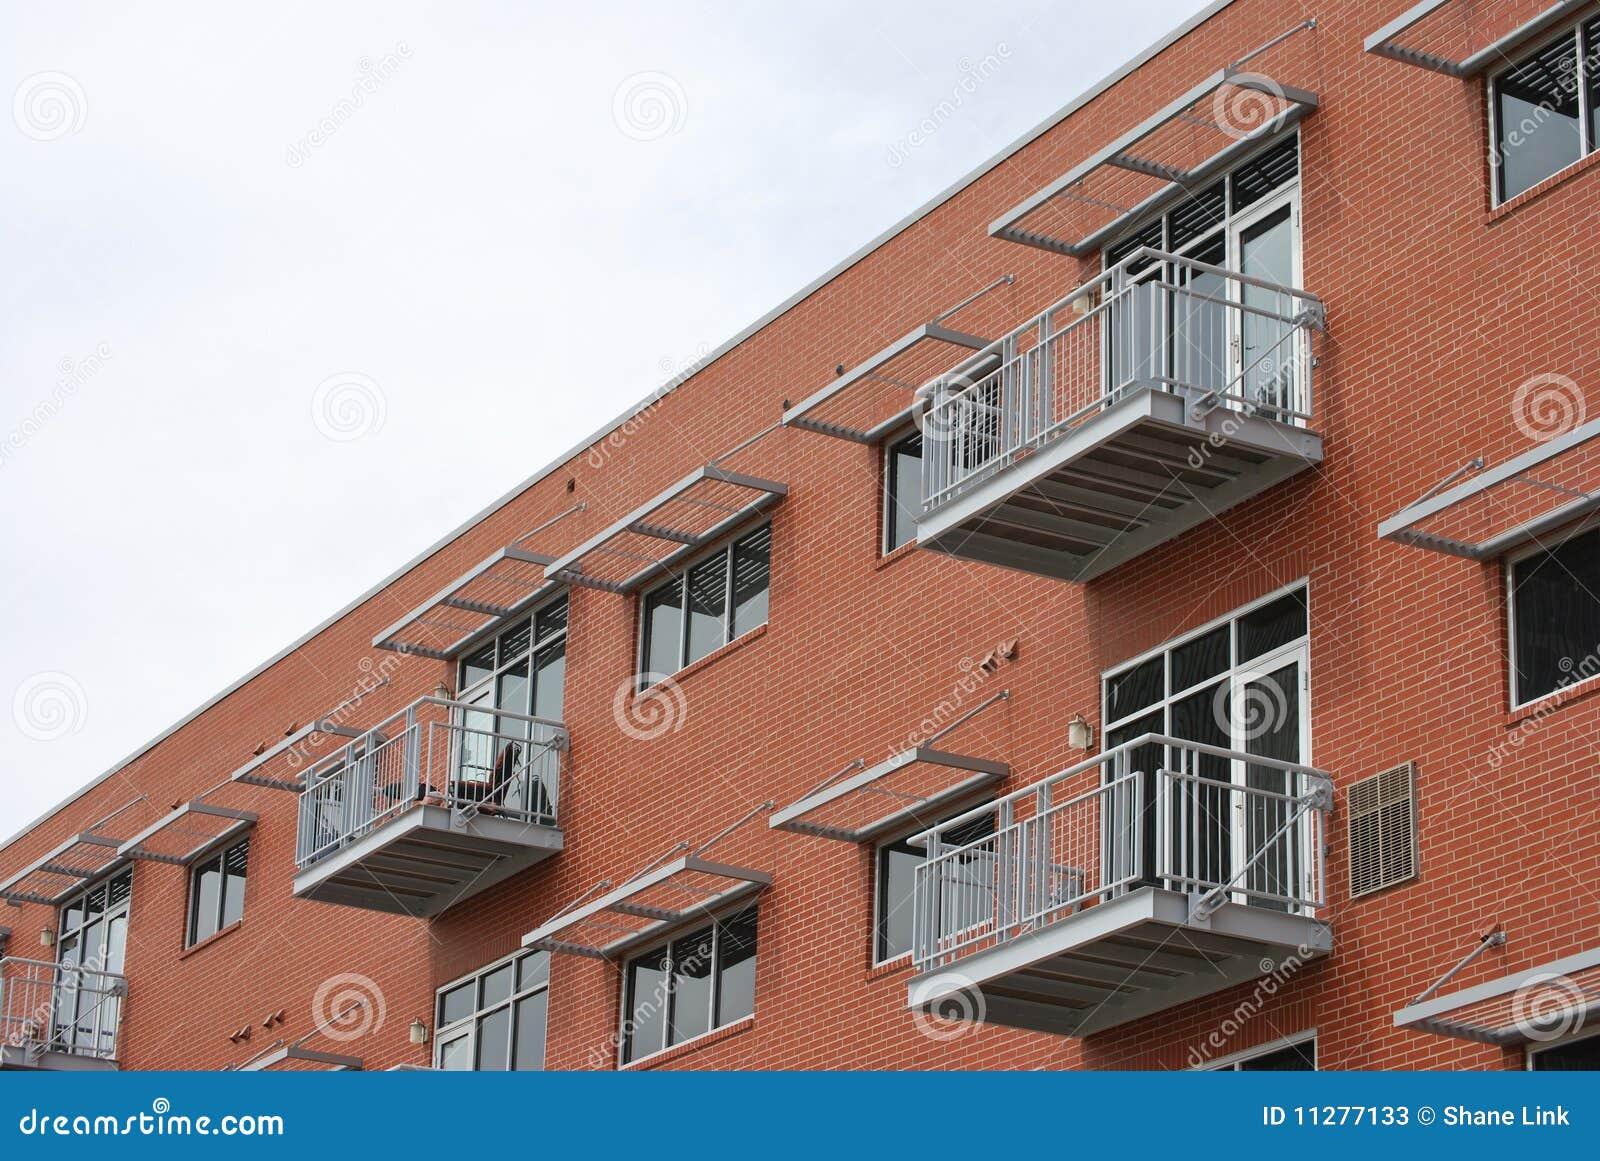 Loft Style Homes Stock Photos Image 11277133